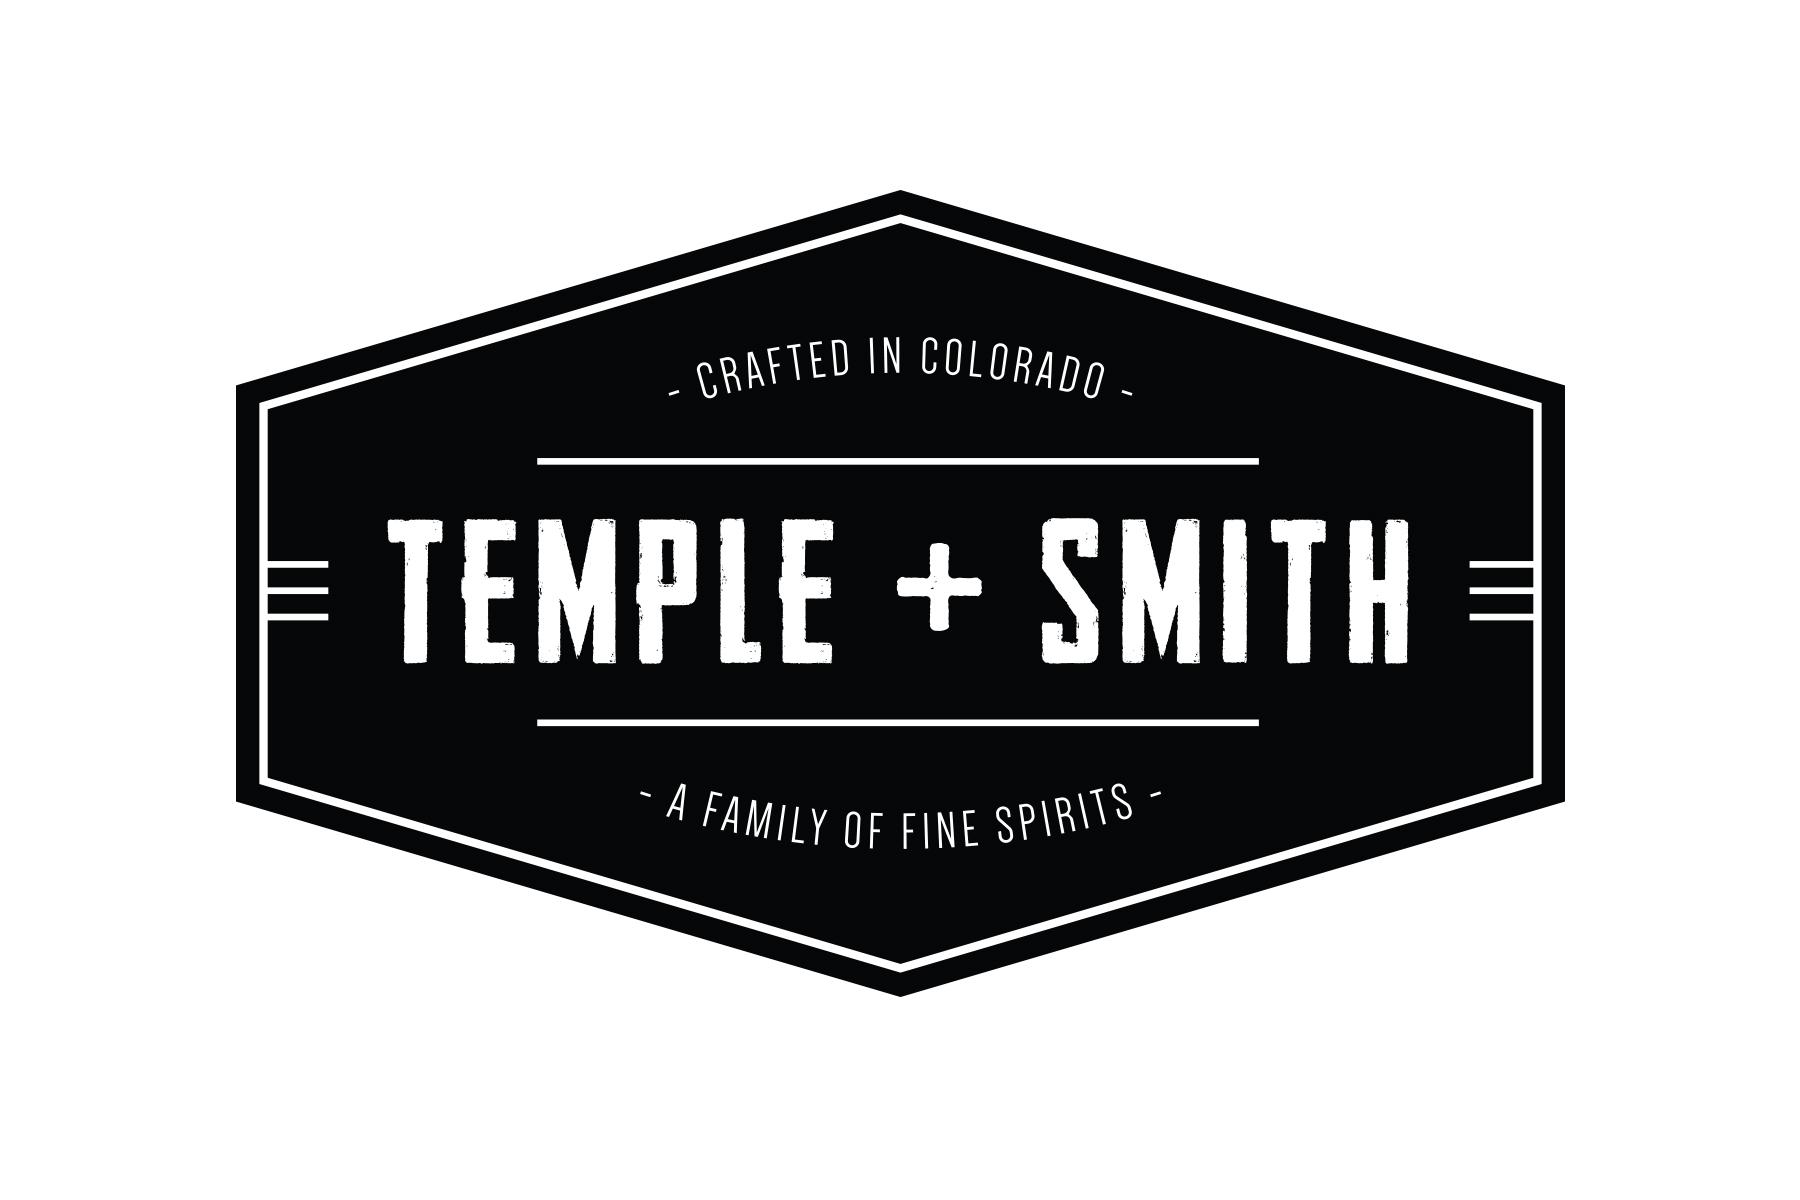 TempleSmith_6x4_ALT5.jpg